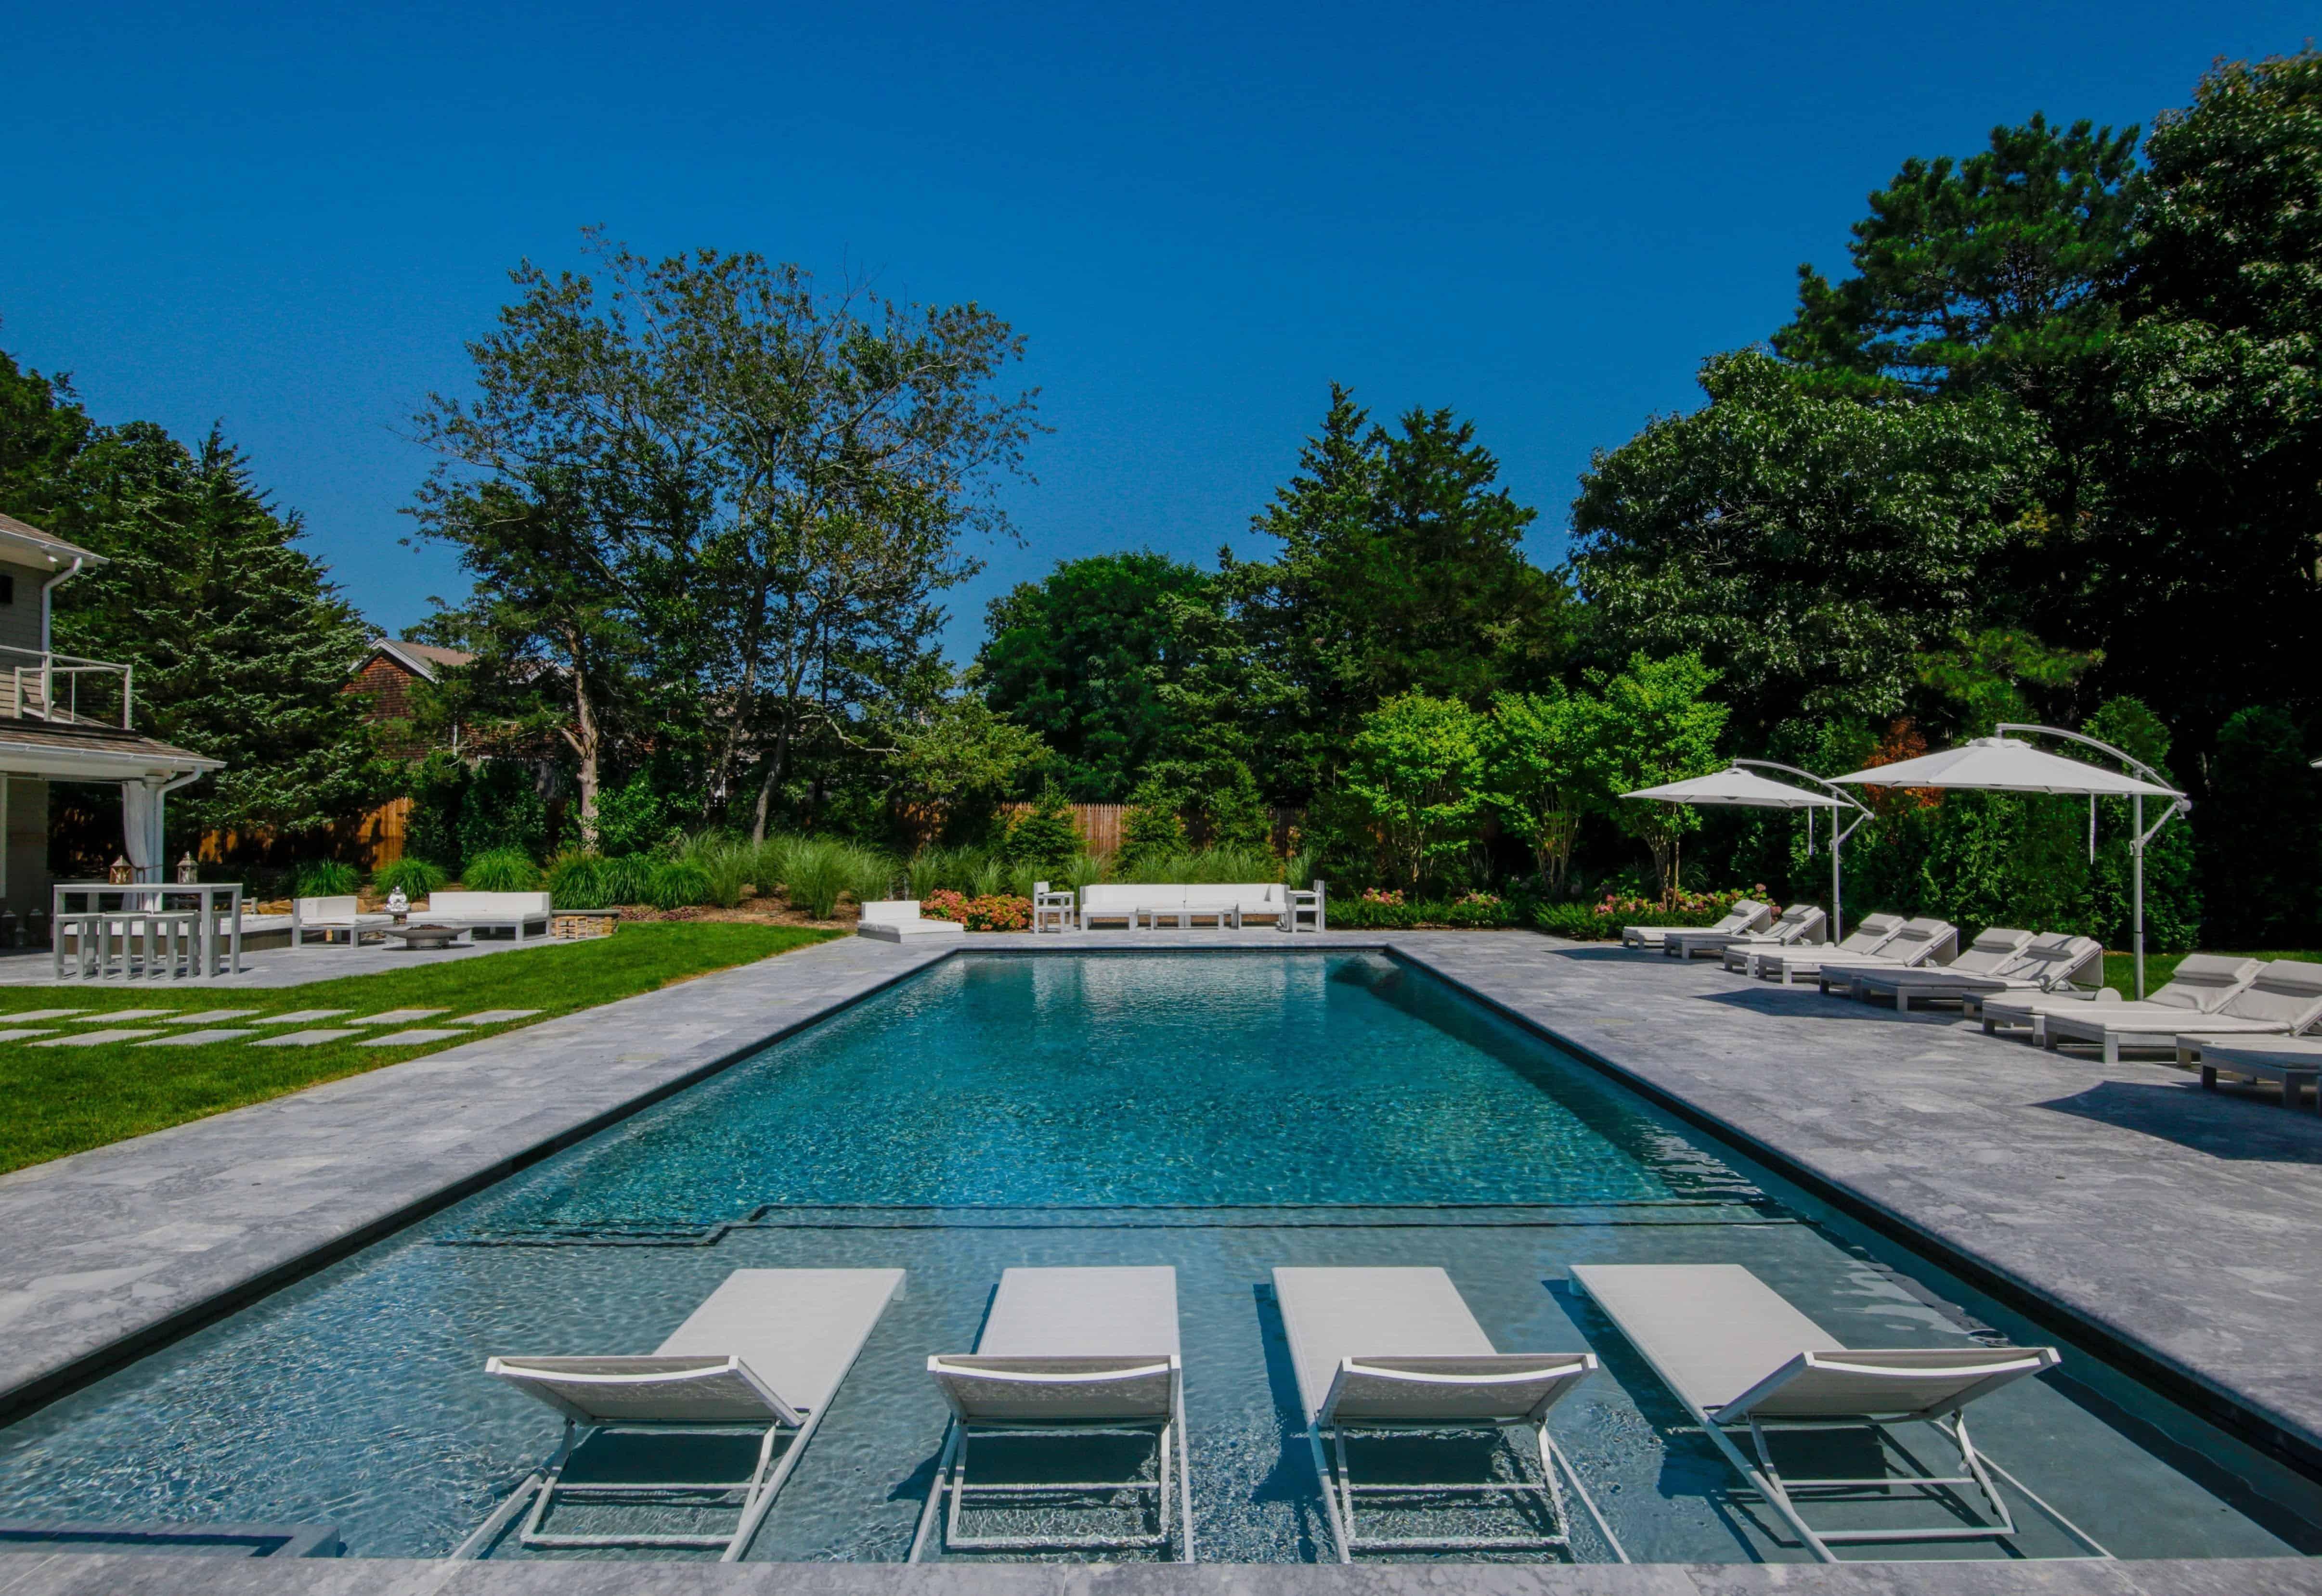 20' x 50' Gunite Pool with Sun Deck - Sag Harbor, Long Island NY